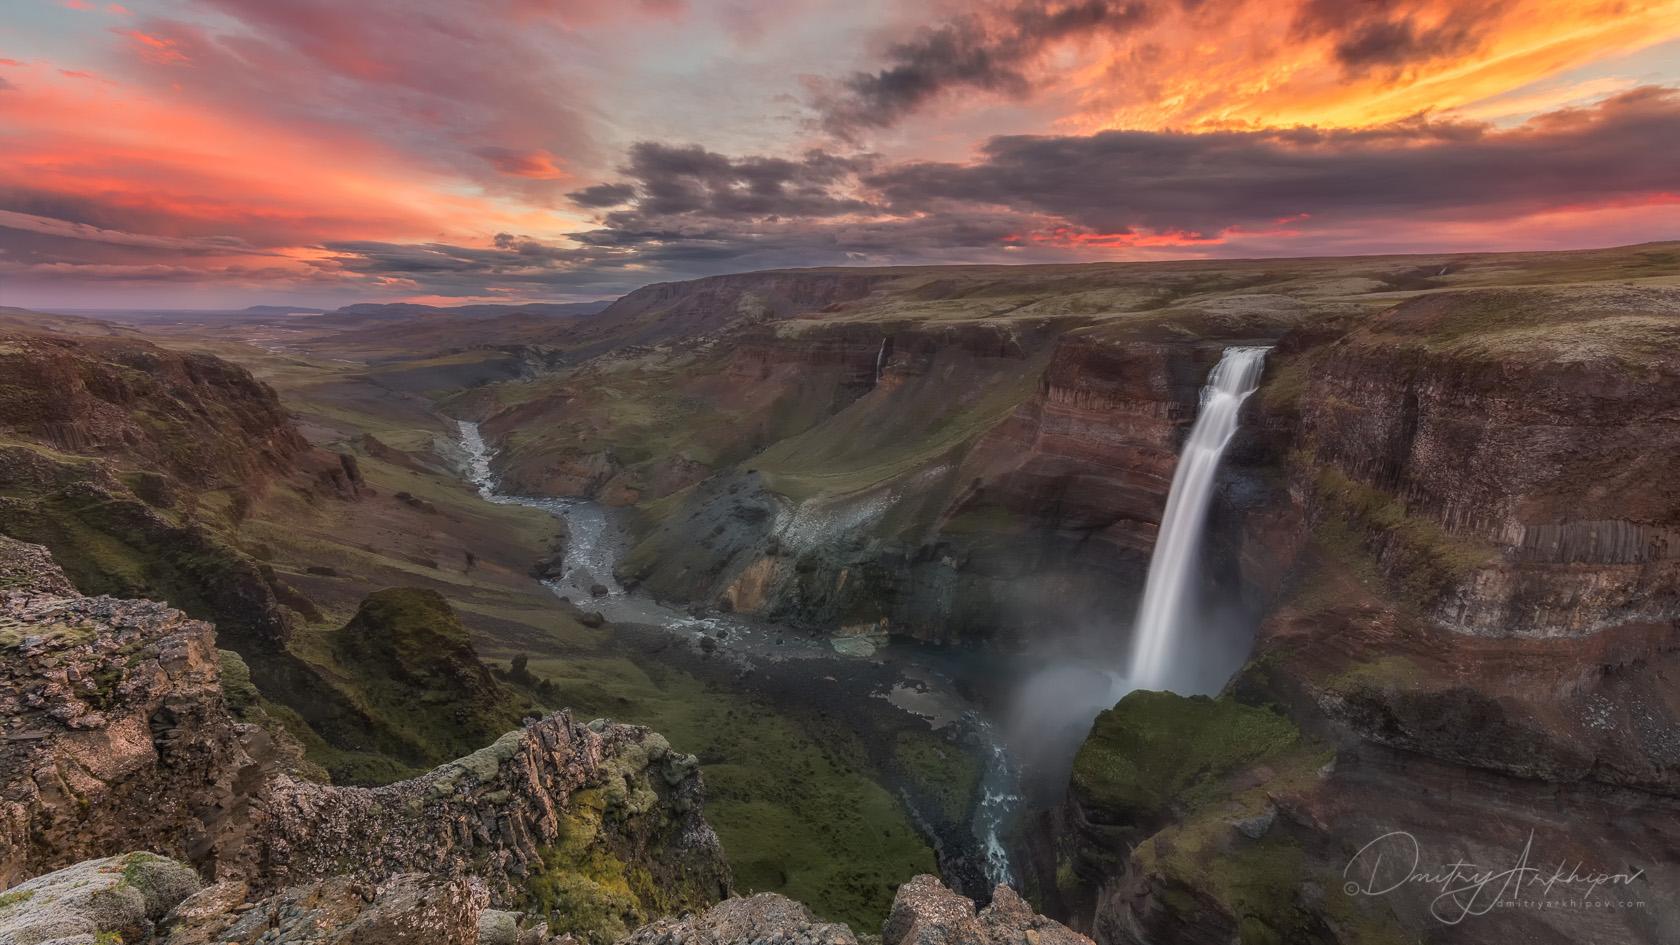 Icelandic photo trip. Landscape photography